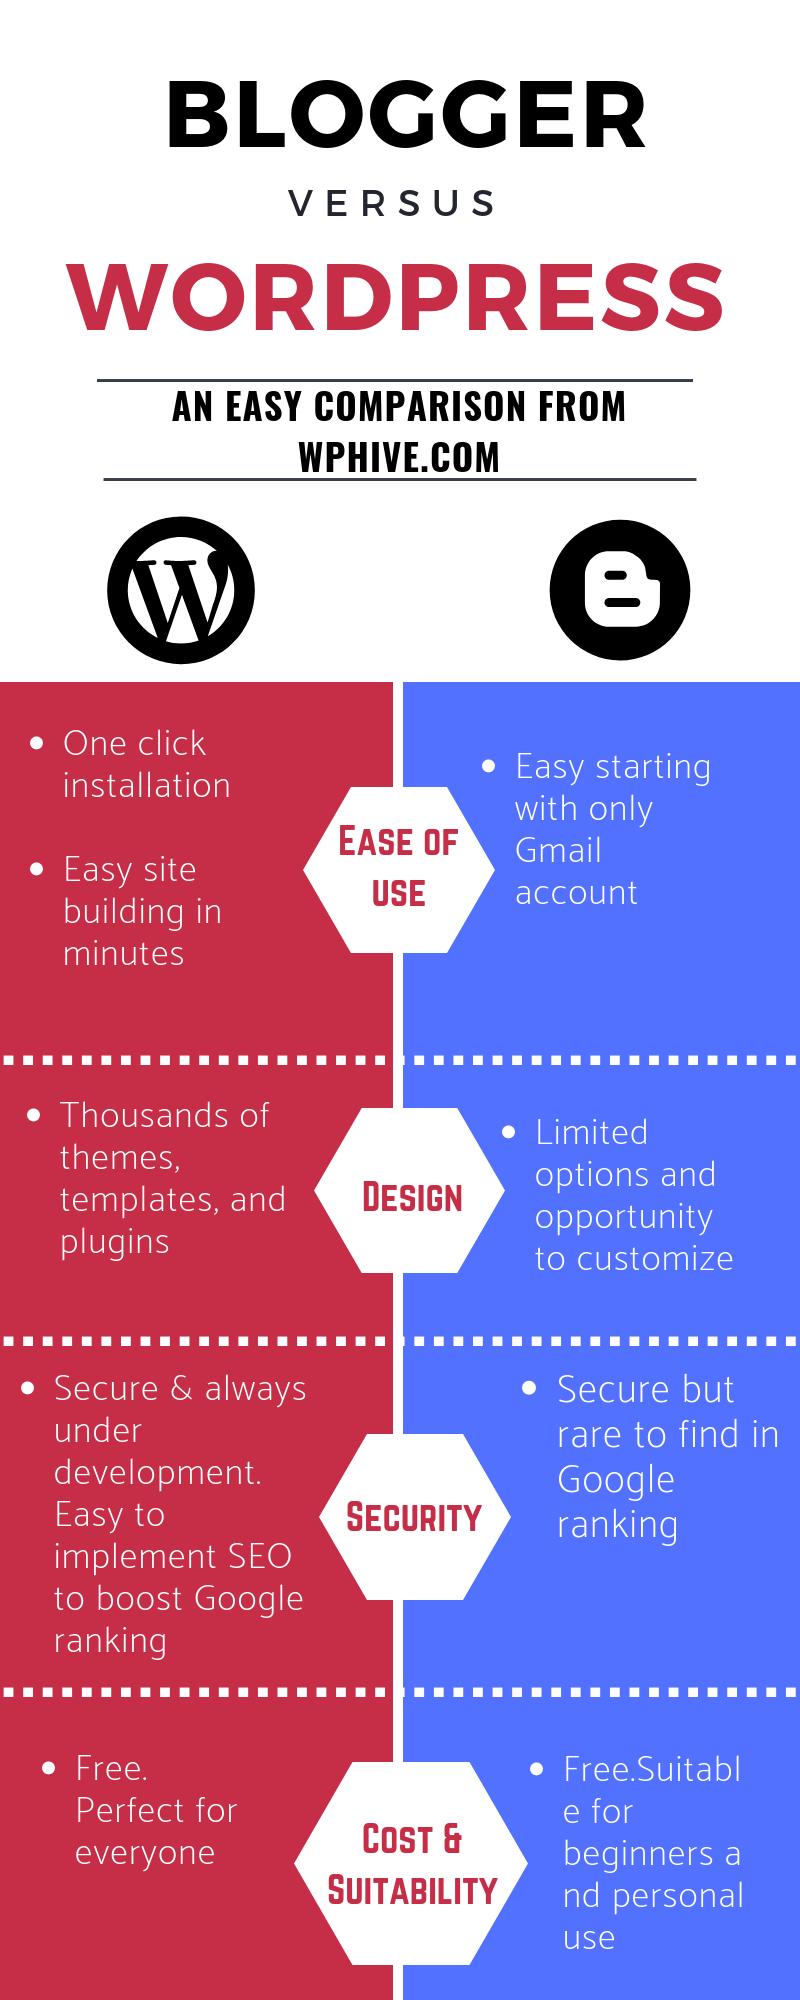 WordPress vs Blogger 2019 Infographic